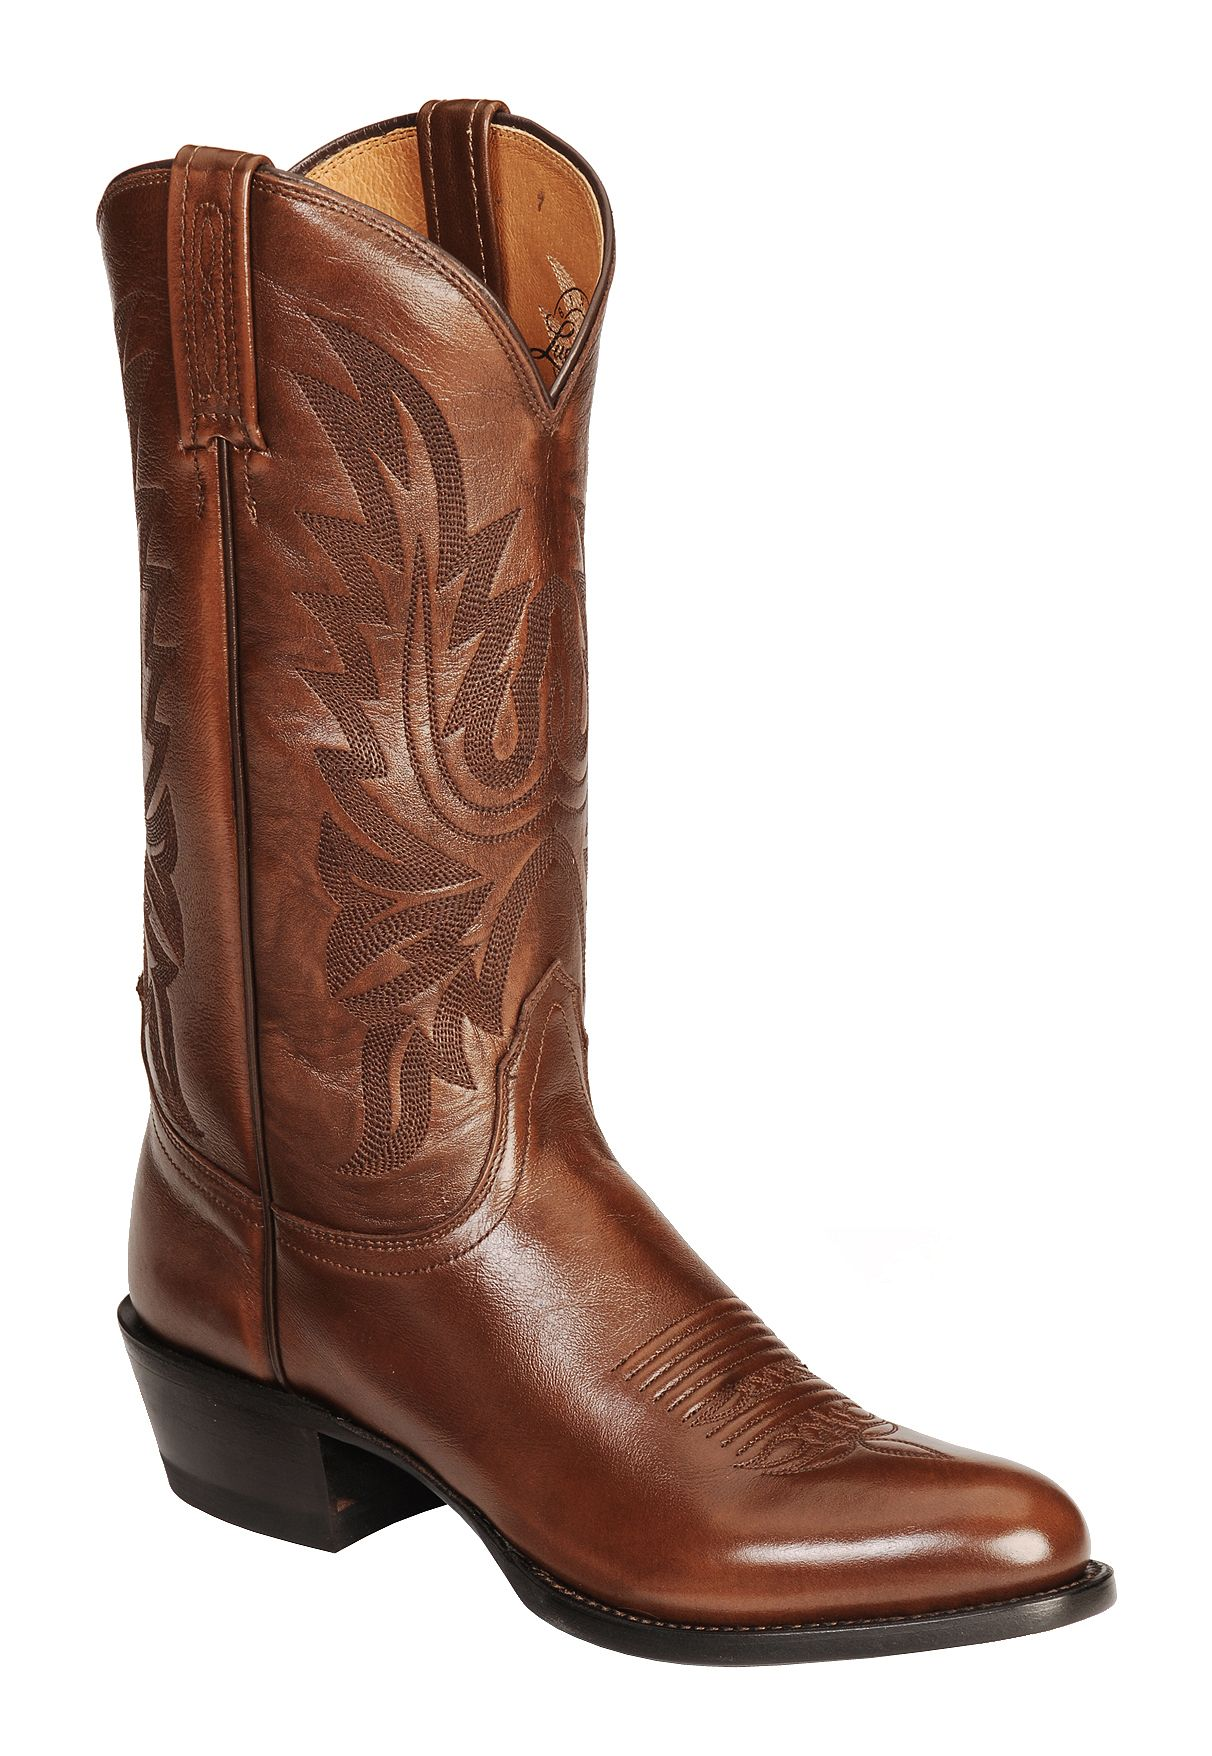 Lucchese Handcrafted Lonestar Calf Cowboy Boots Medium